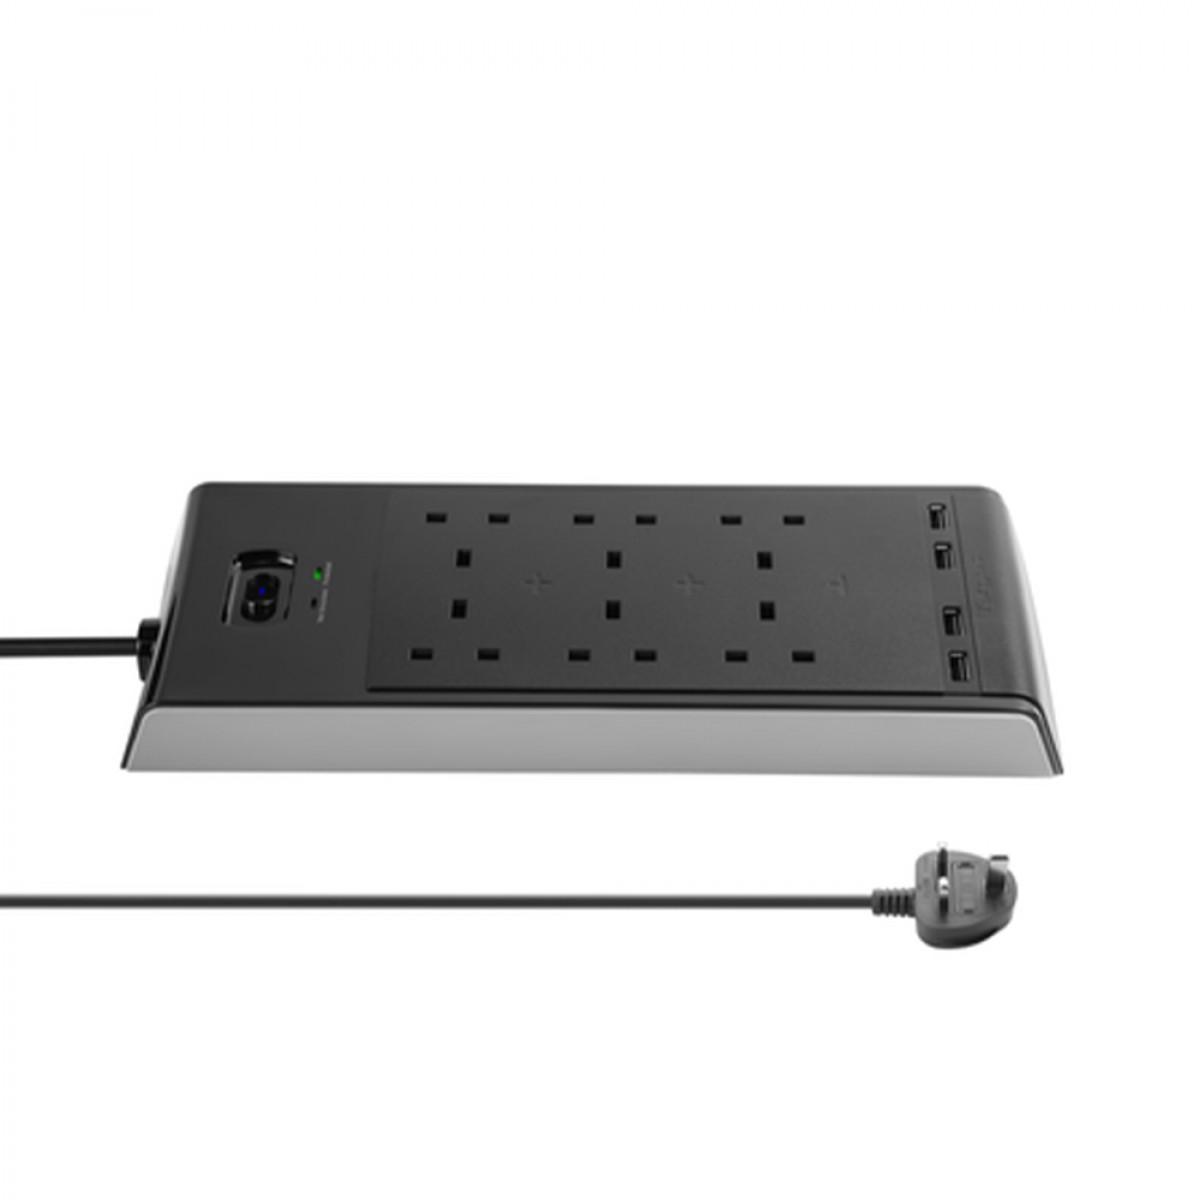 Targus Smart Surge 6 with 4 USB Ports - VEVE